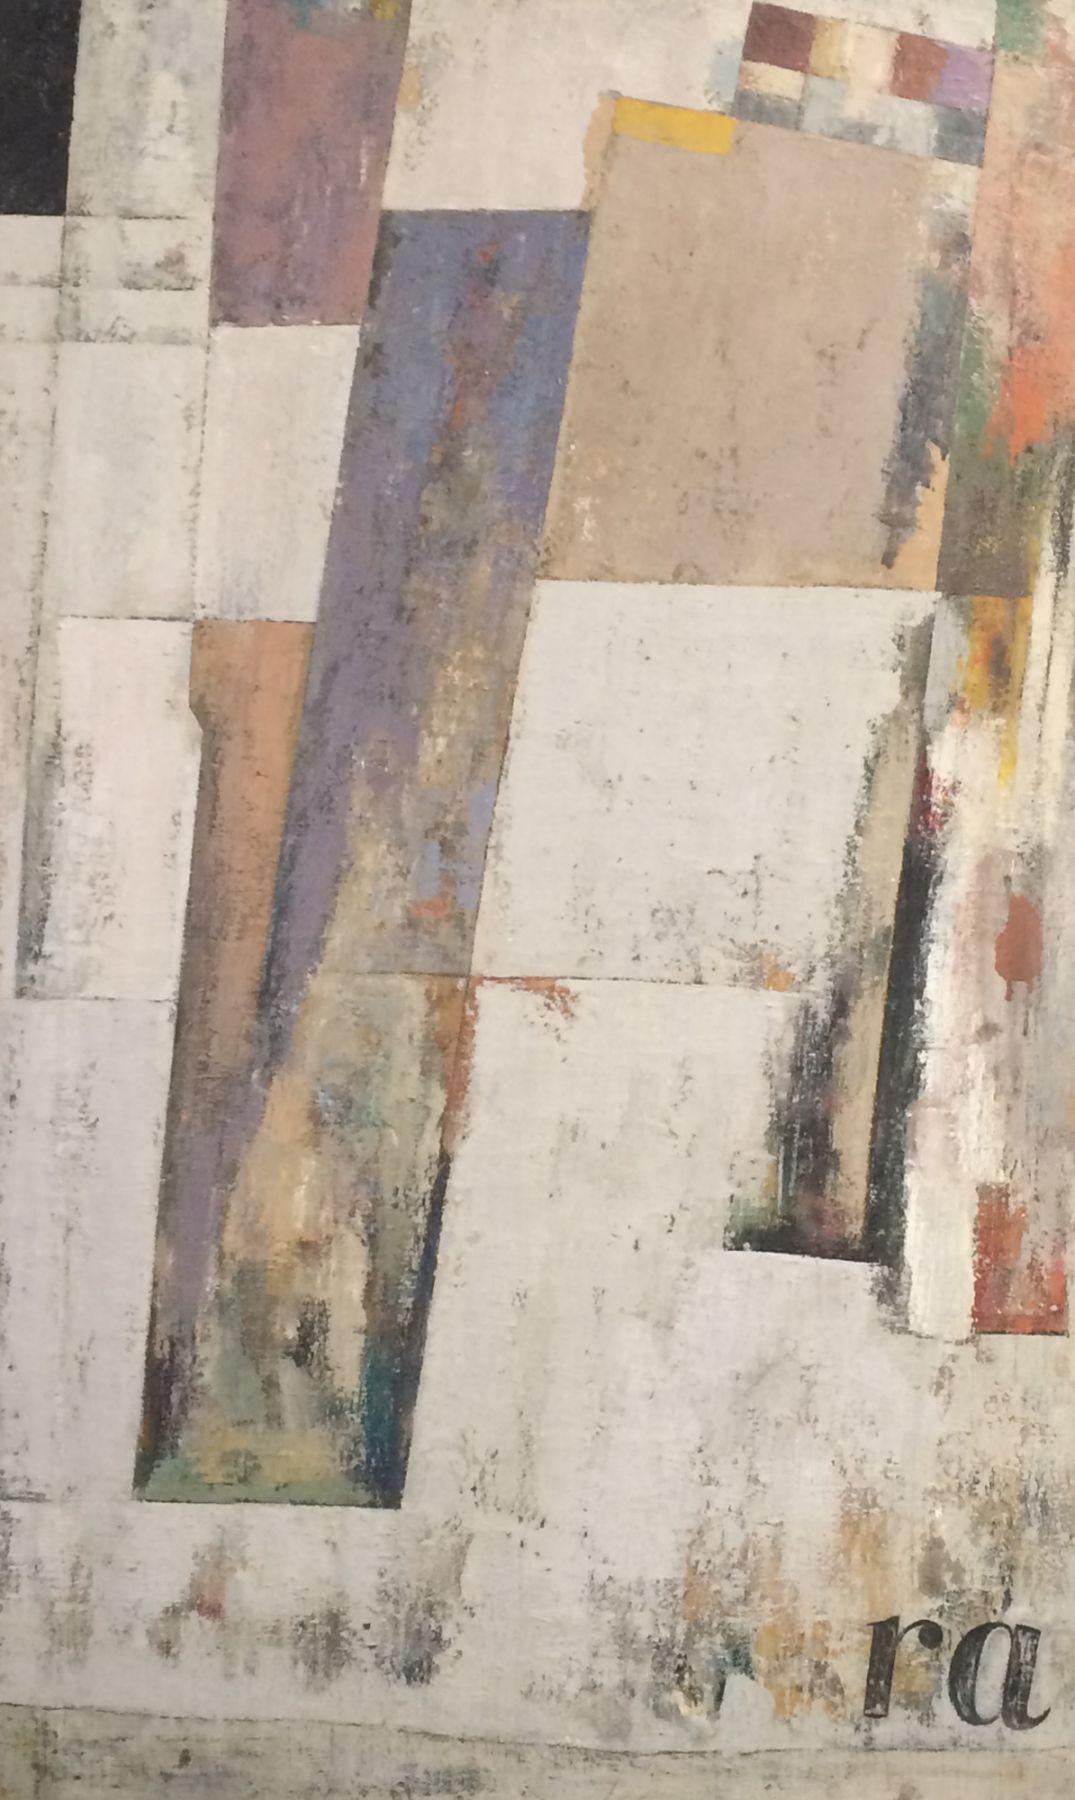 Joseph Gualtieri, Ancient Walls